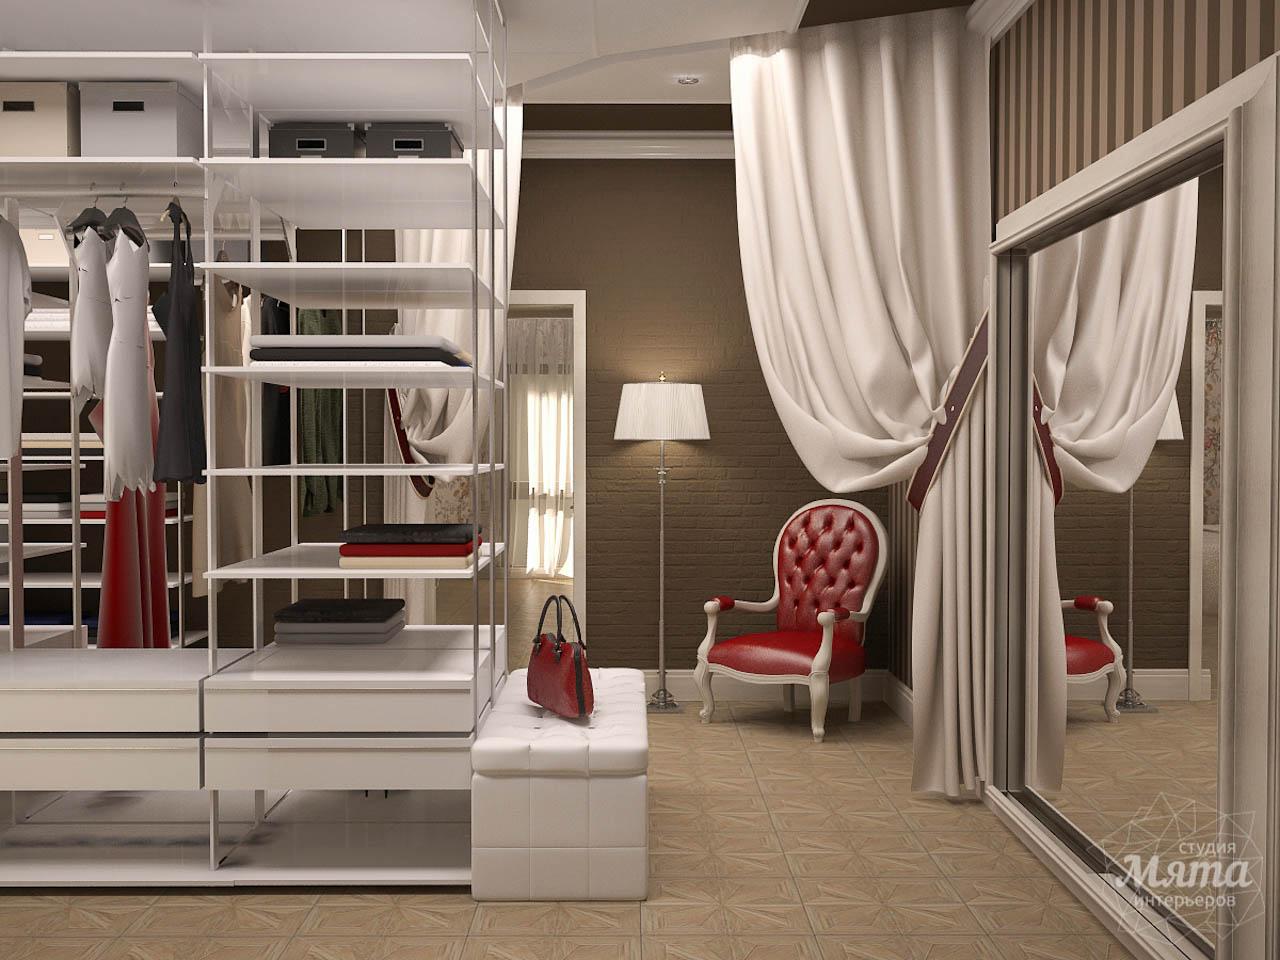 Дизайн интерьера коттеджа по ул. Ландышевая 23 img17496851